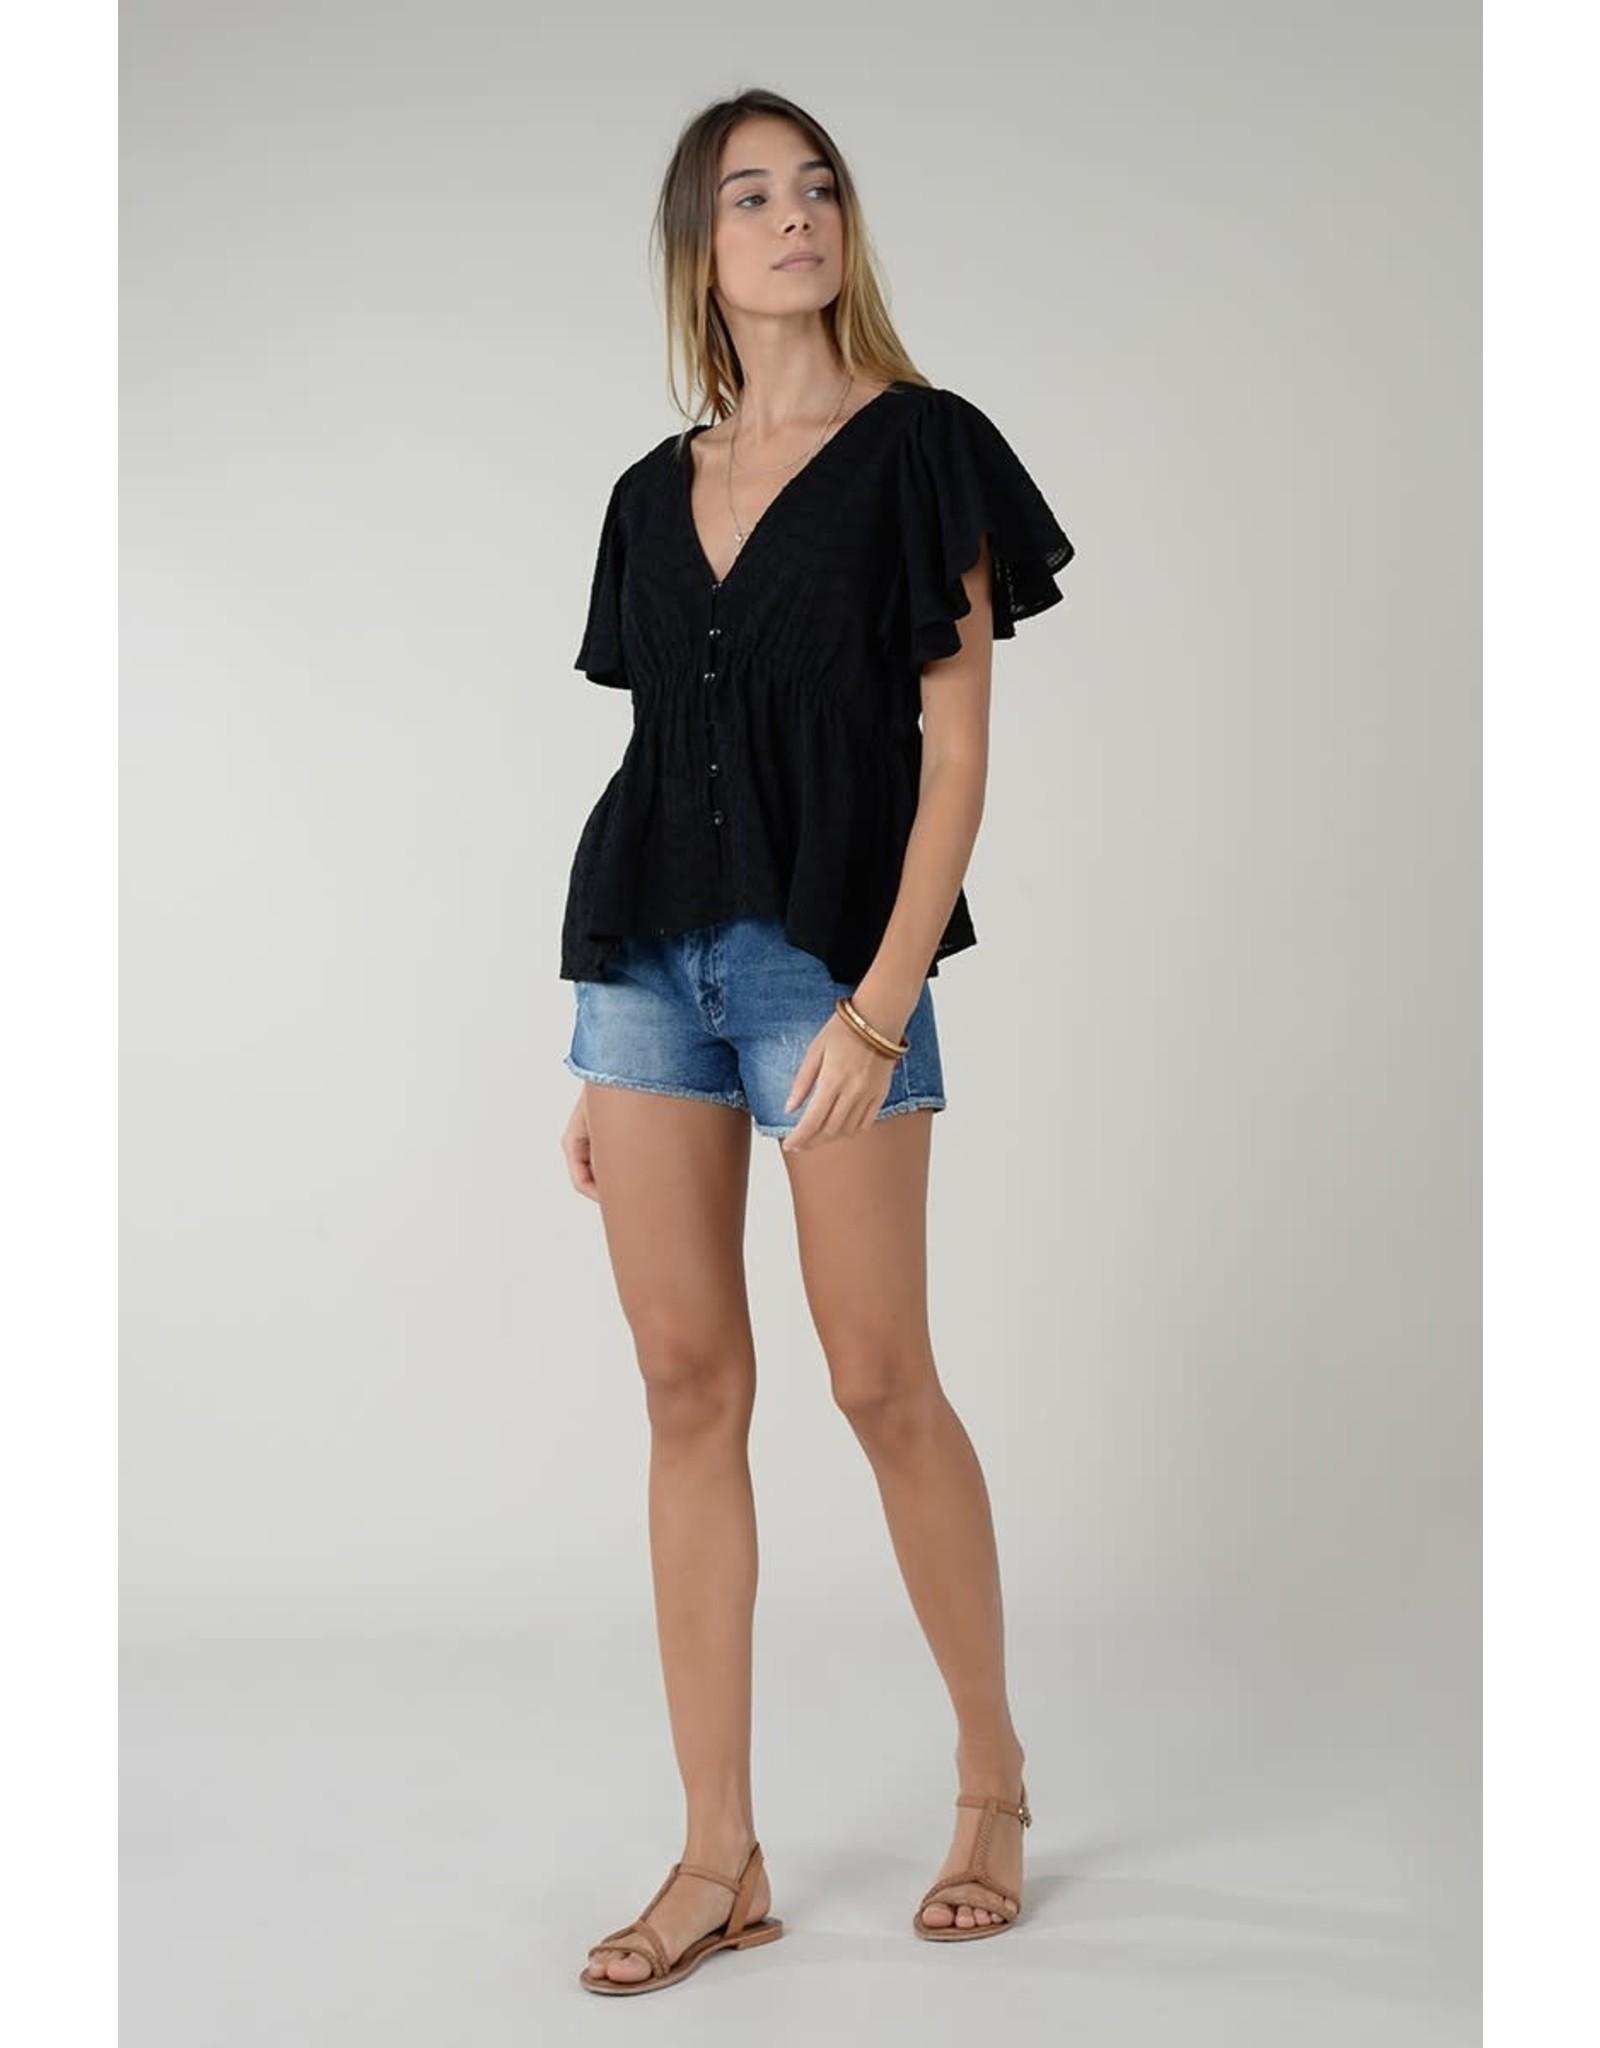 Molly Bracken Molly Bracken - Ruffle sleeve top (black)